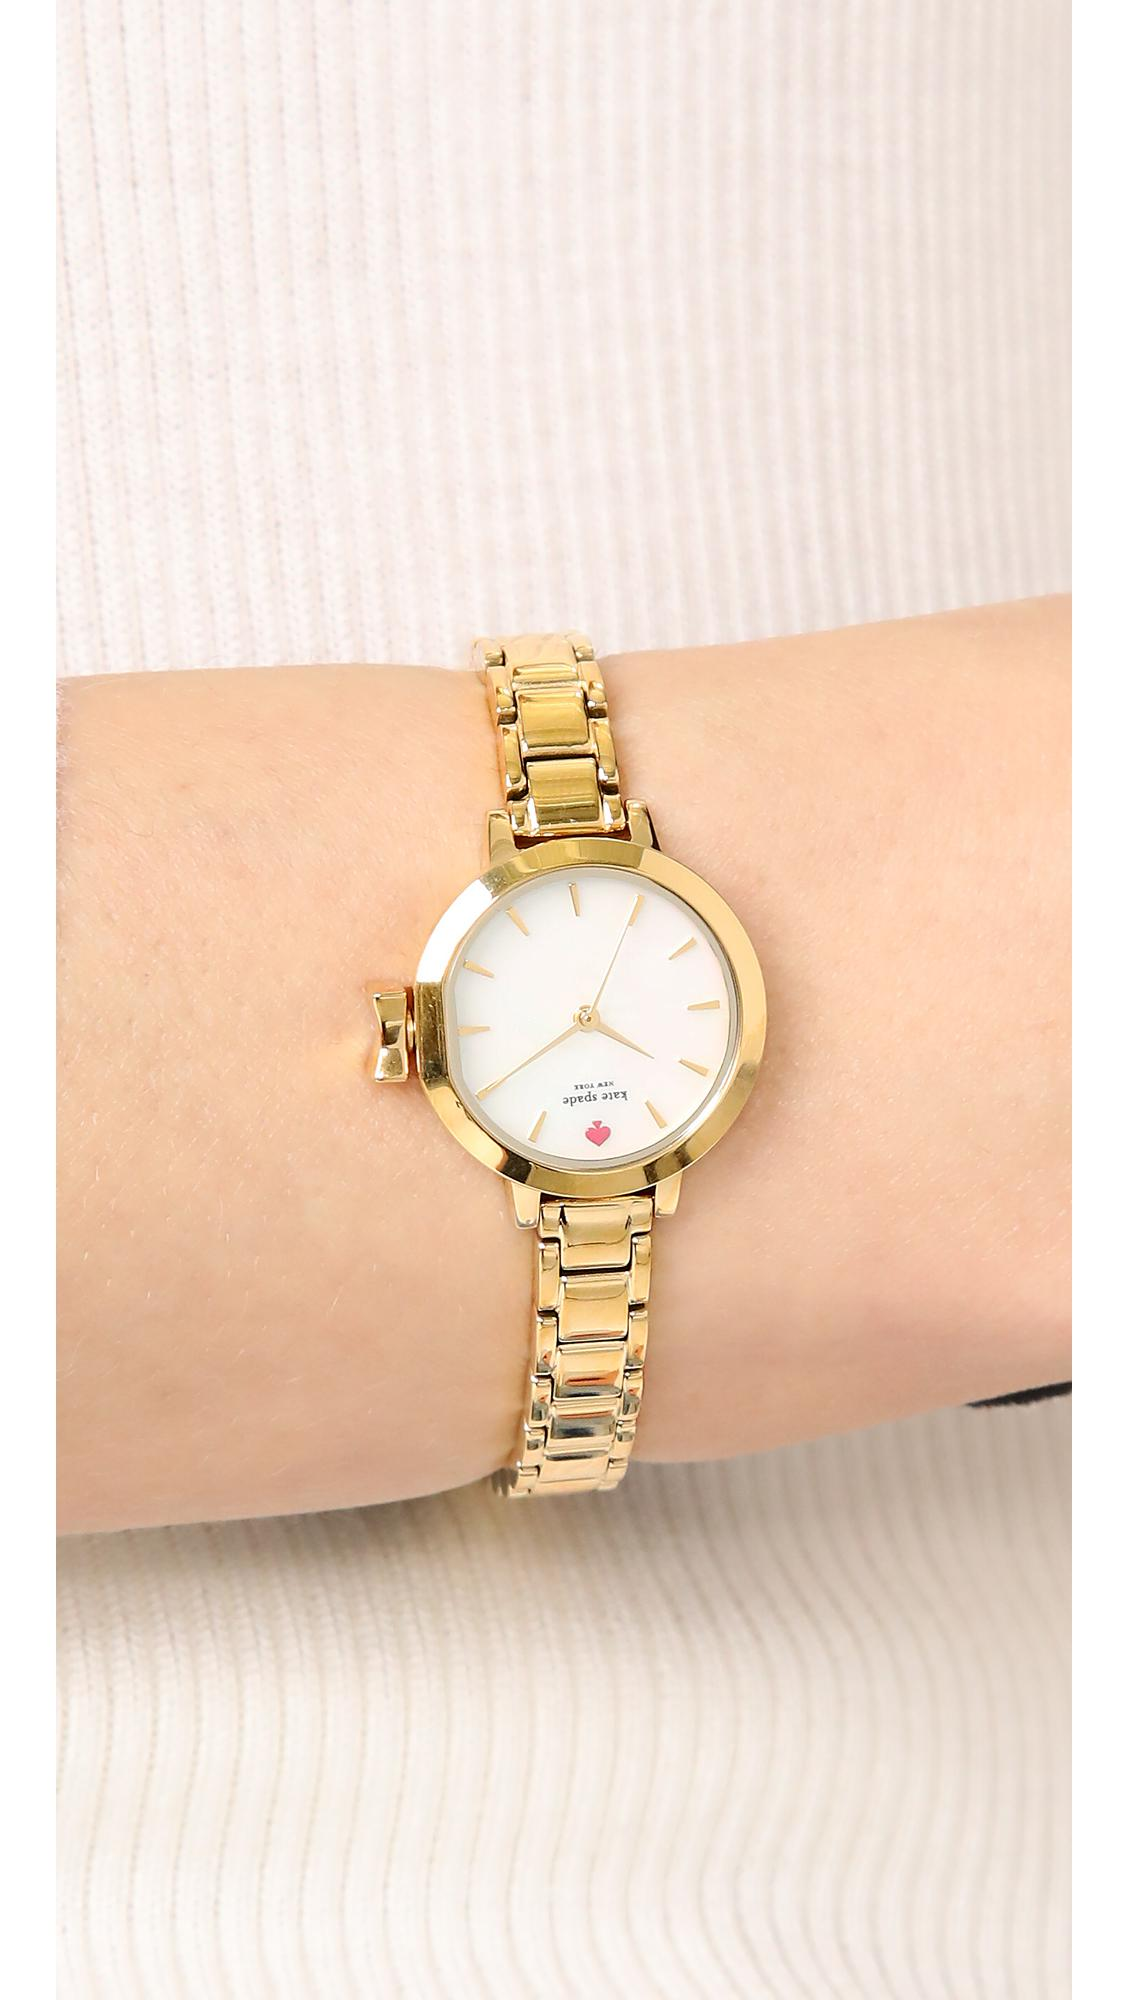 c65b1c81b Kate Spade Mini Park Row Watch in Metallic - Lyst